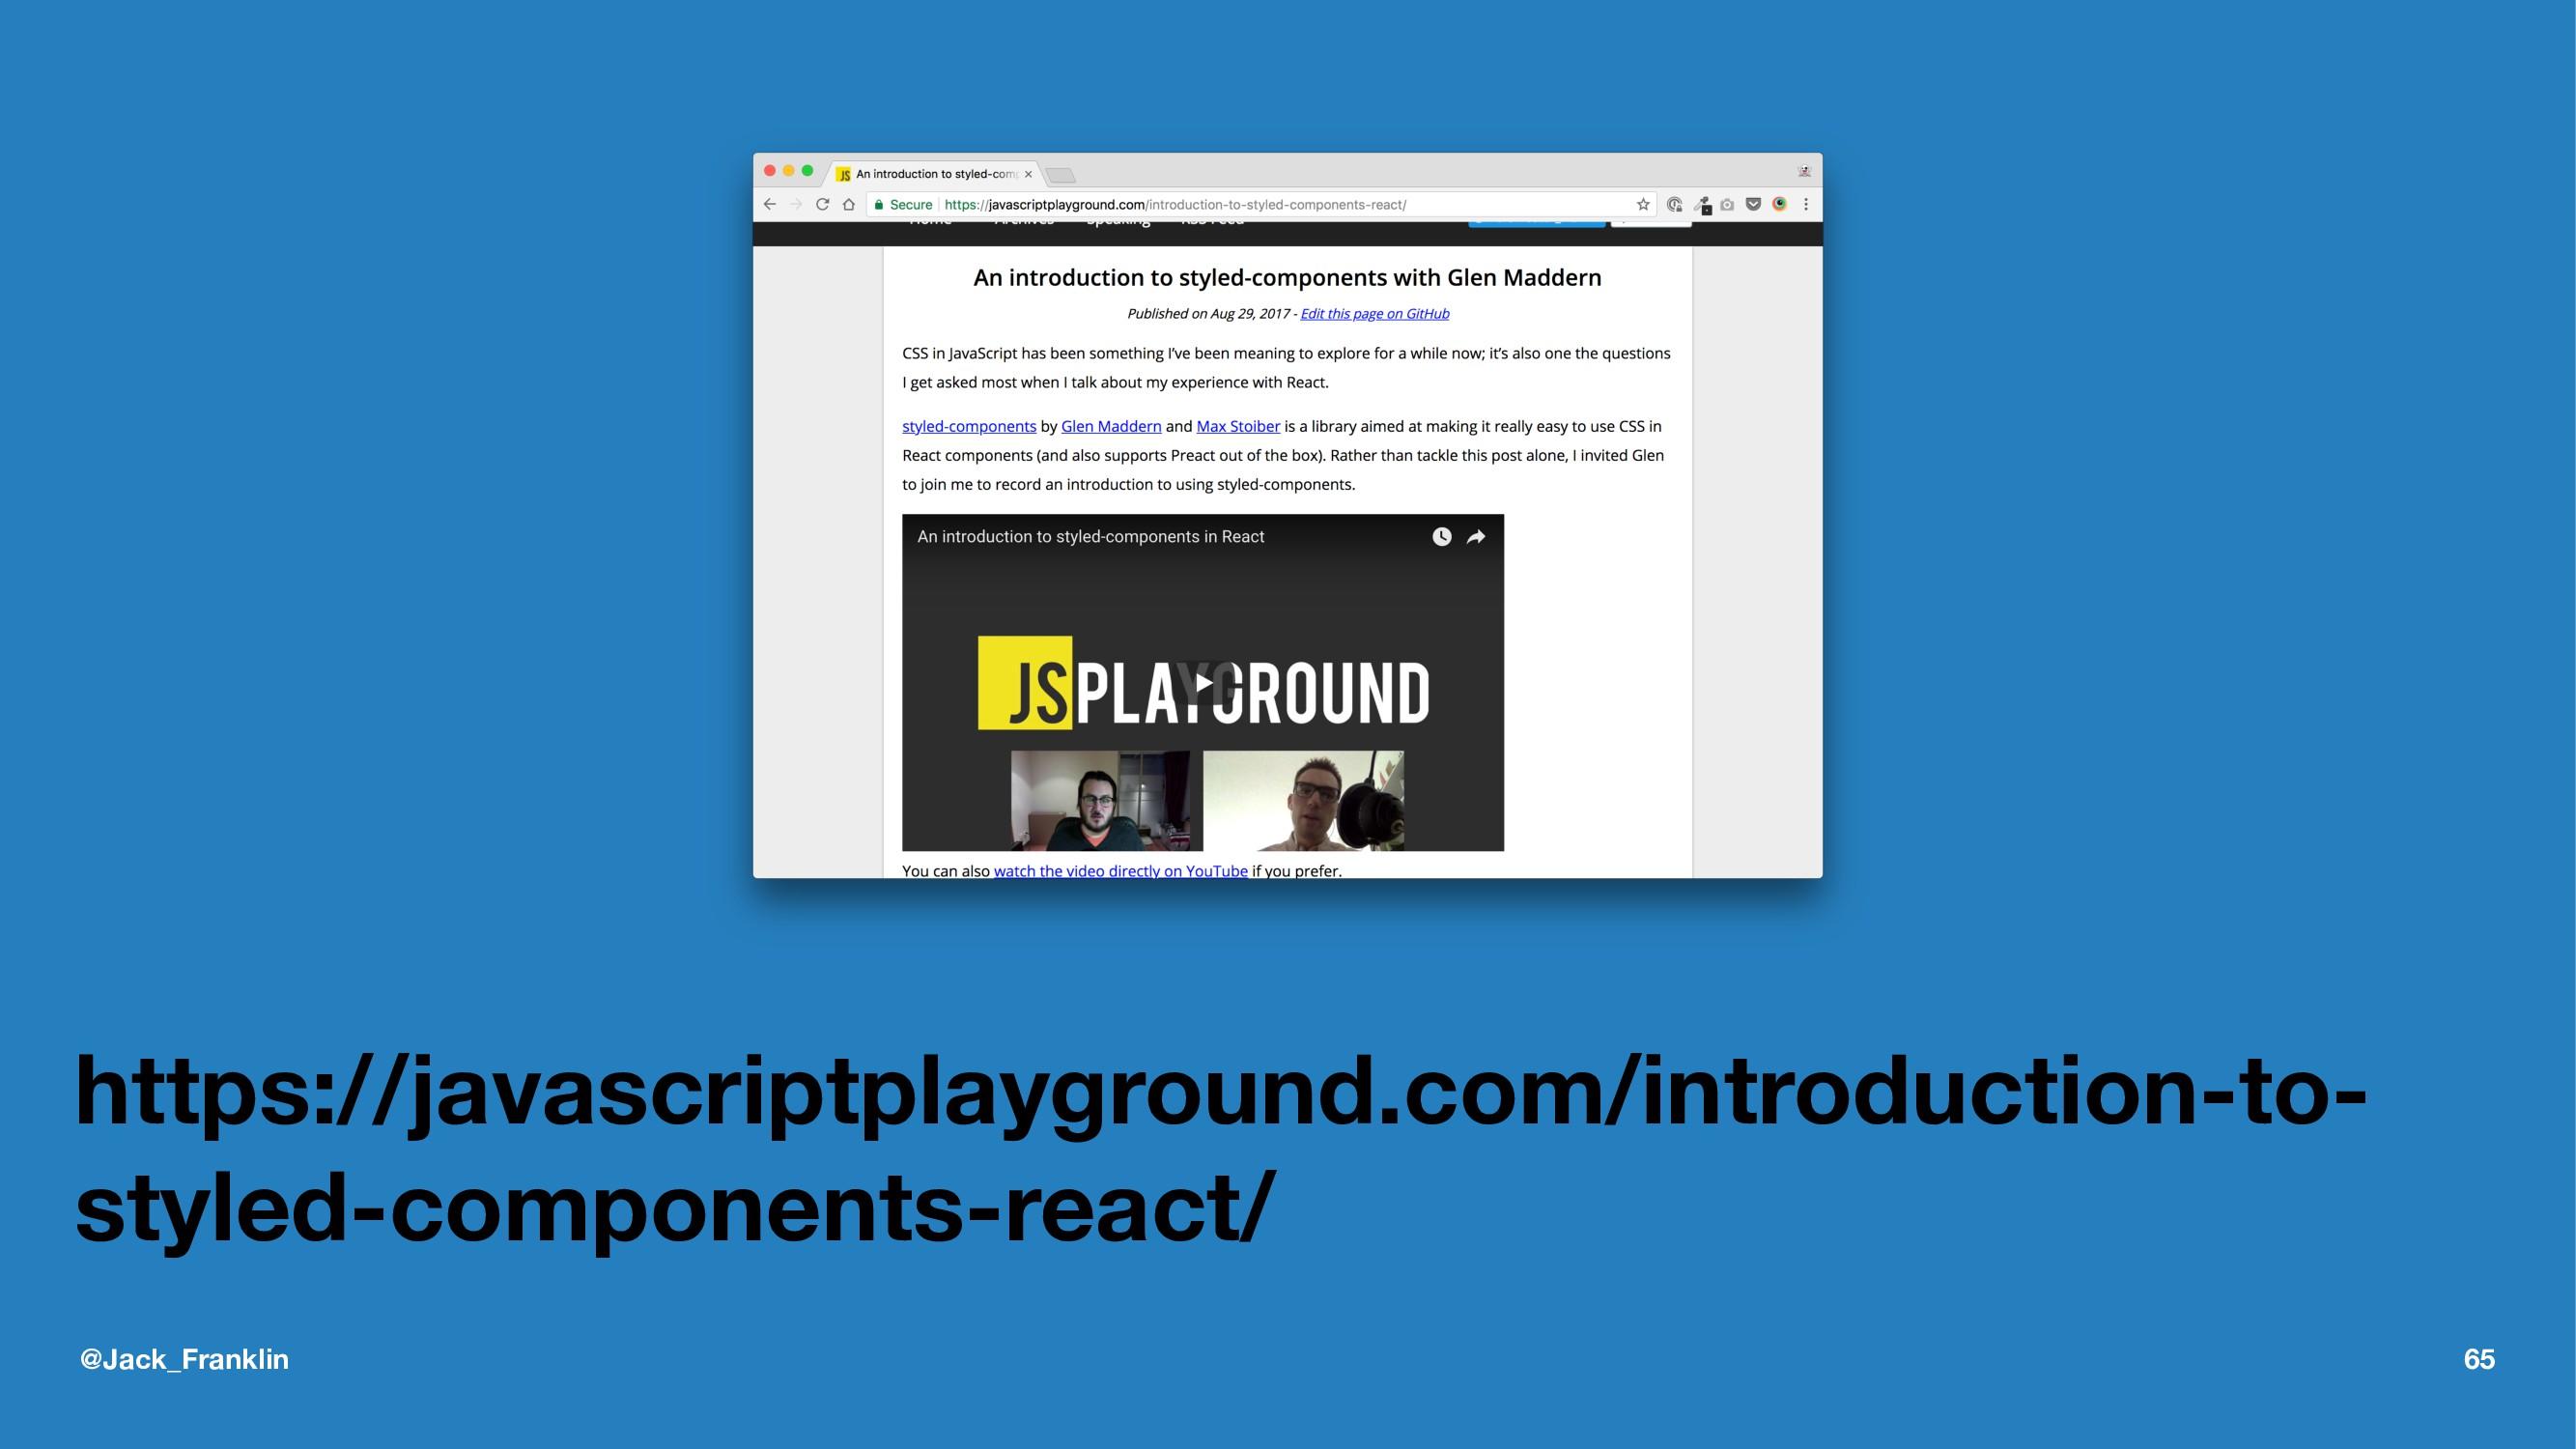 https://javascriptplayground.com/introduction-t...